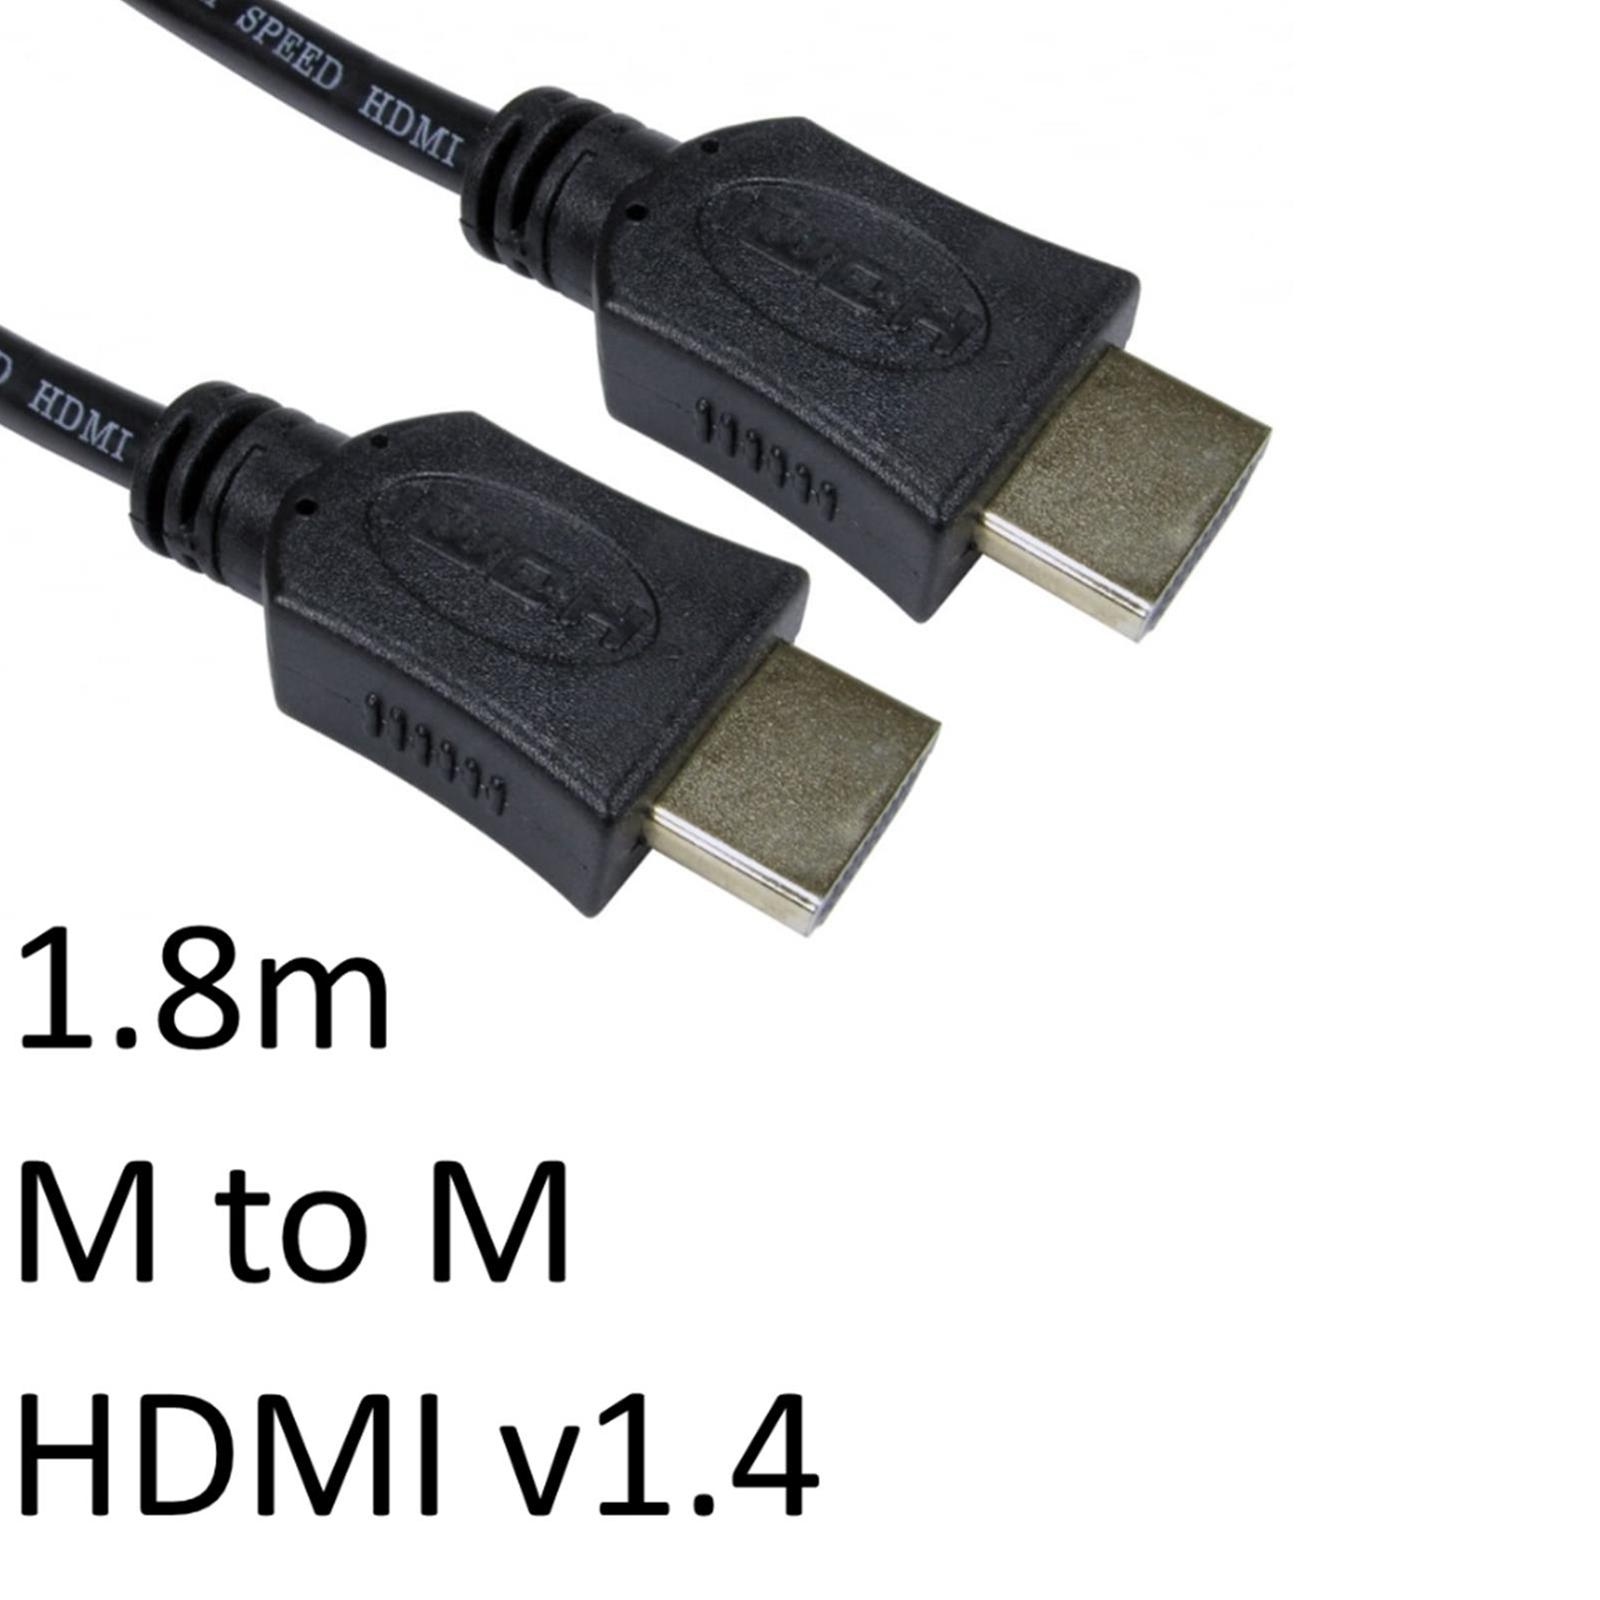 HDMI 1.4 (M) to HDMI 1.4 (M) 1.8m Black OEM Display Cable